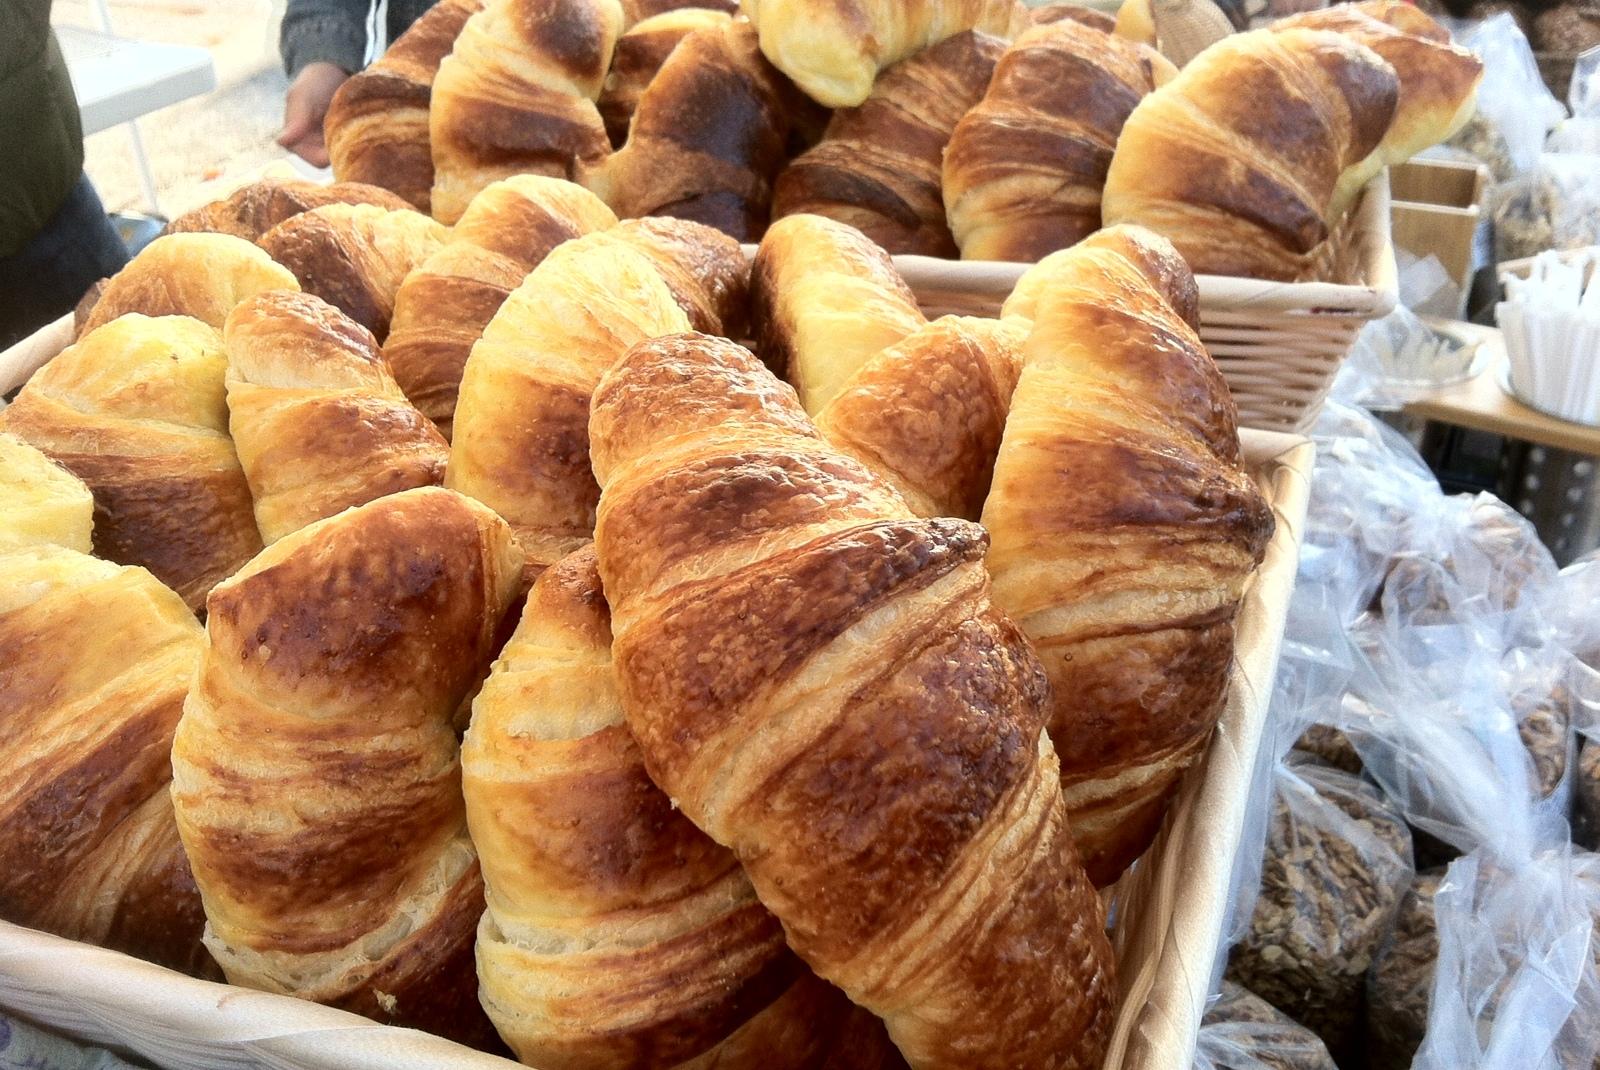 Croissants at the Farmer's Market